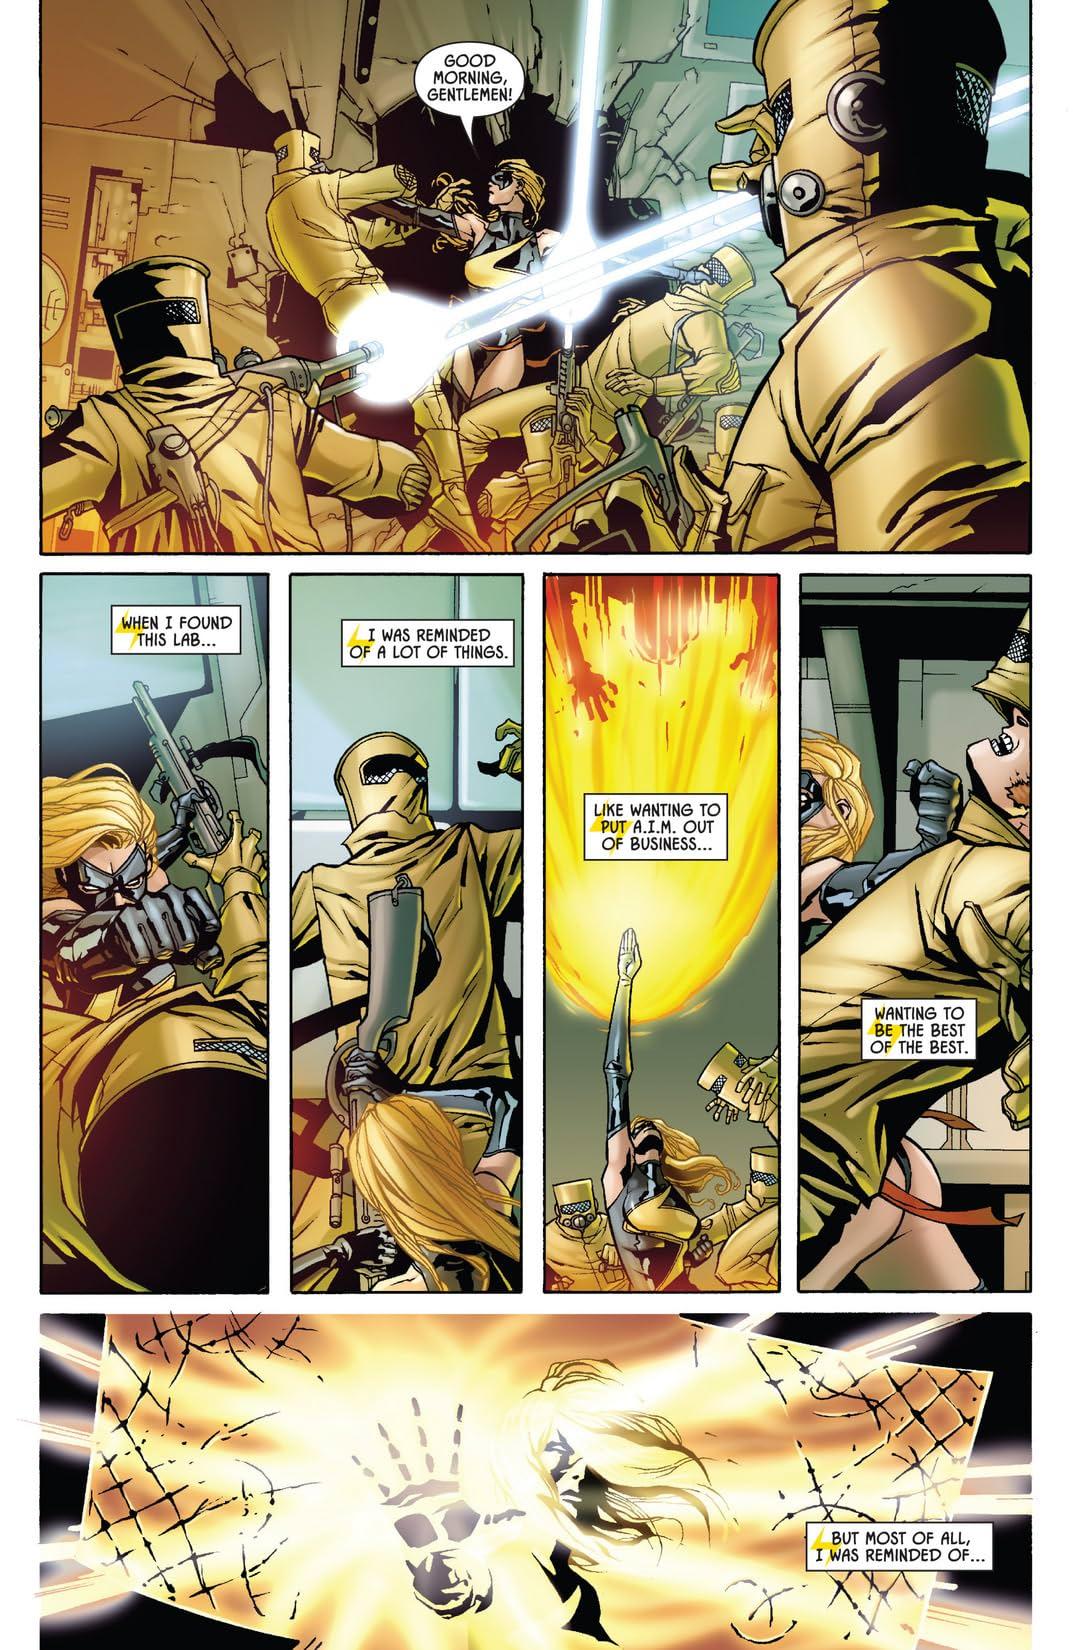 Ms. Marvel (2006-2010) Special: Storyteller